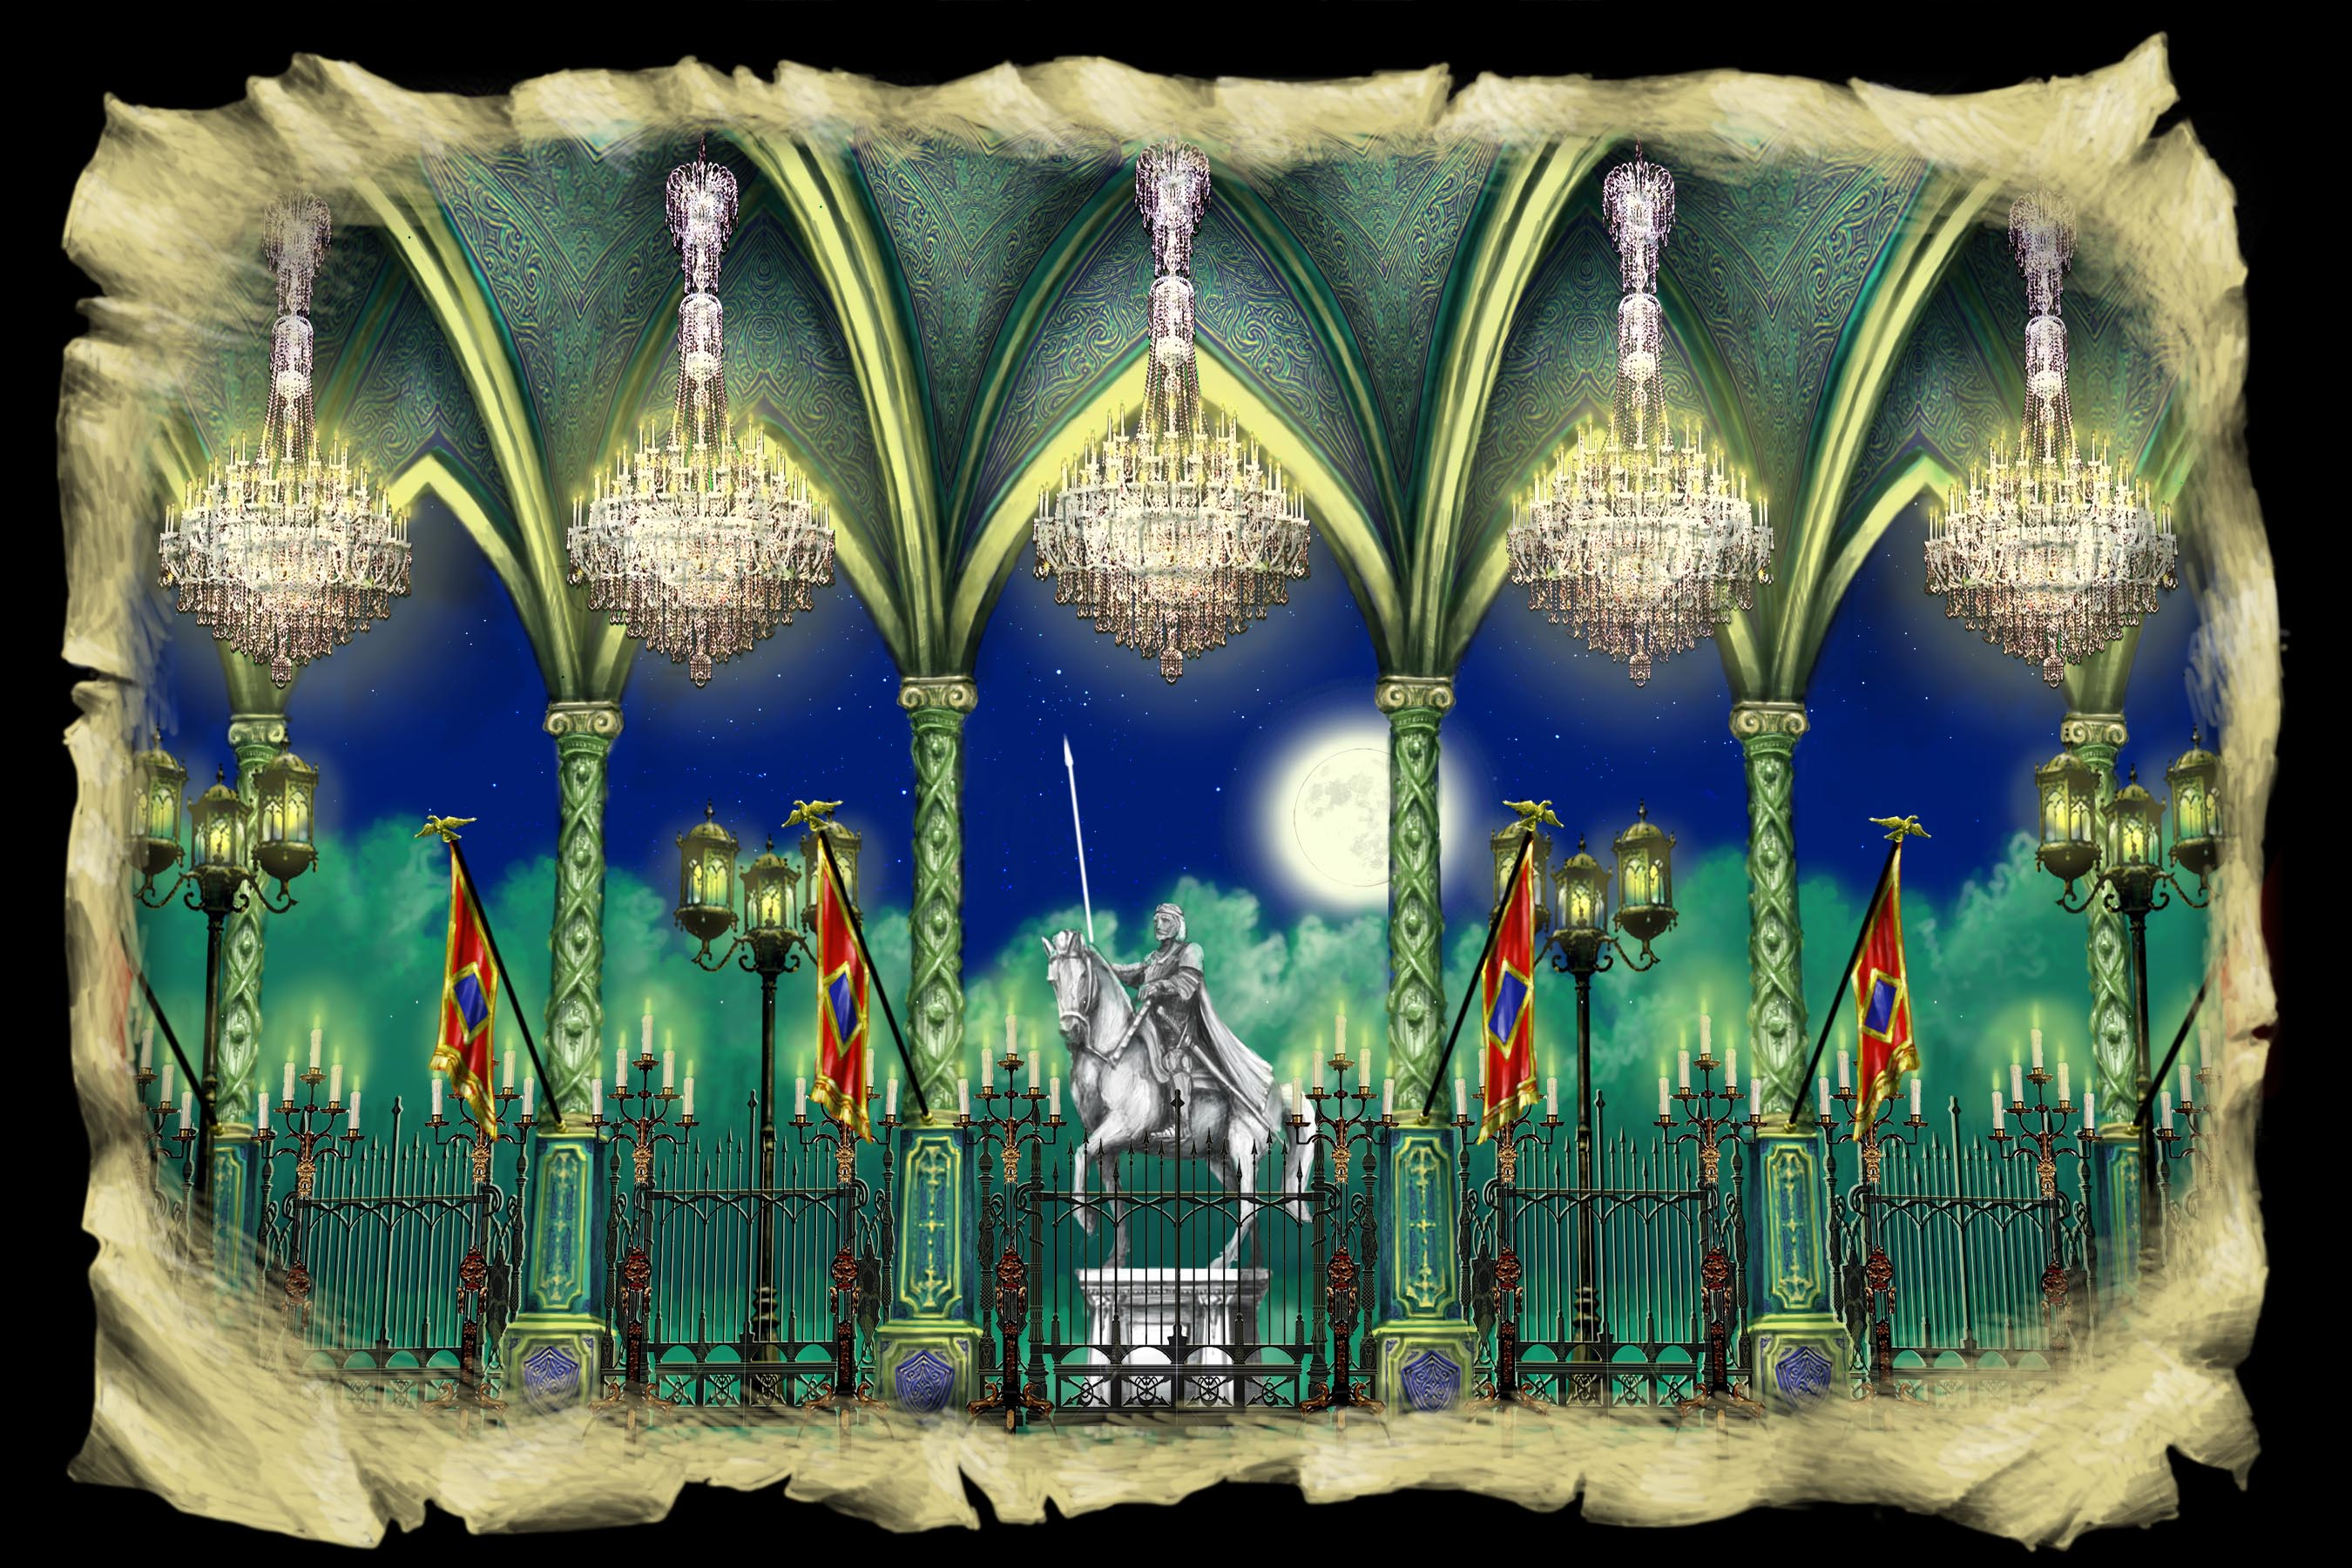 Scene 6. Palace Ballroom